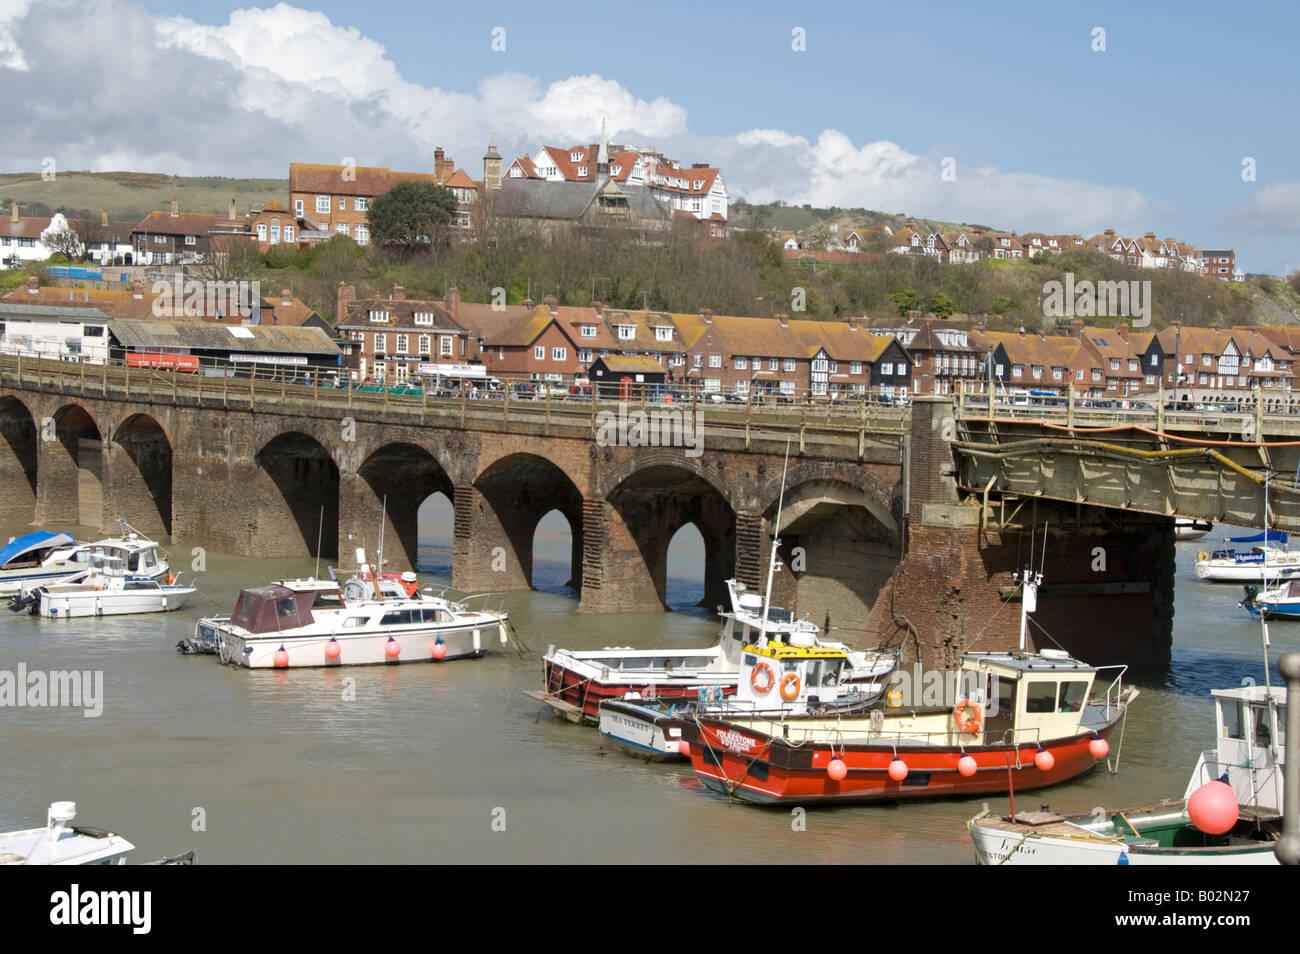 The viaduct on the Folkestone Harbour Branch, Folkestone Kent, England. - Stock Image